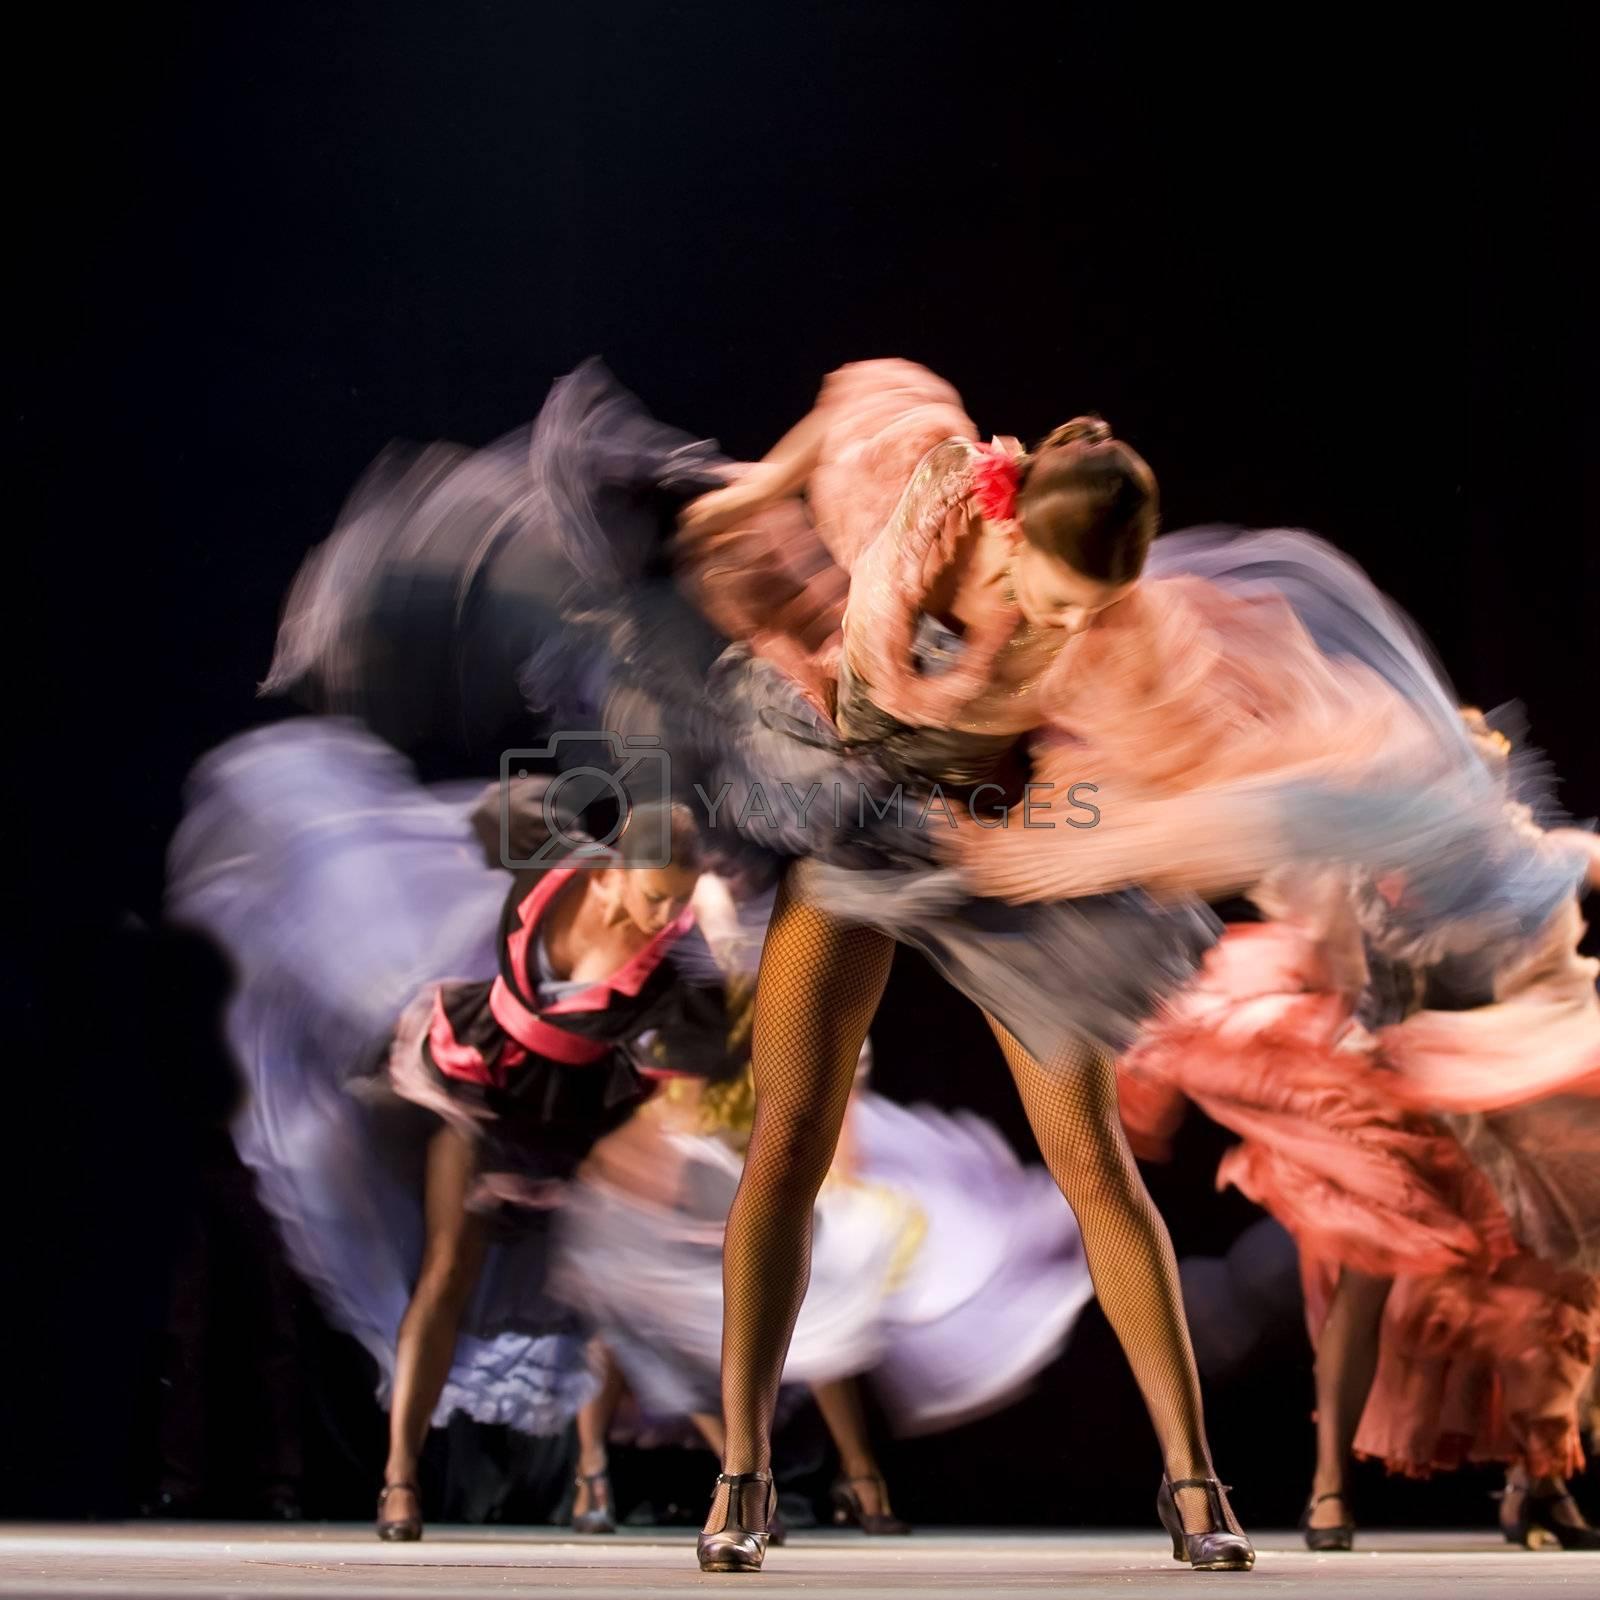 "CHENGDU - DEC 28: The Ballet Troupe of Spanish Rafael Aguilar(Ballet Teatro Espanol de Rafael Aguilar) perform the best Flamenco Dance Drama ""Carmen"" at JINCHEN theater DEC 28, 2008 in Chengdu, China."